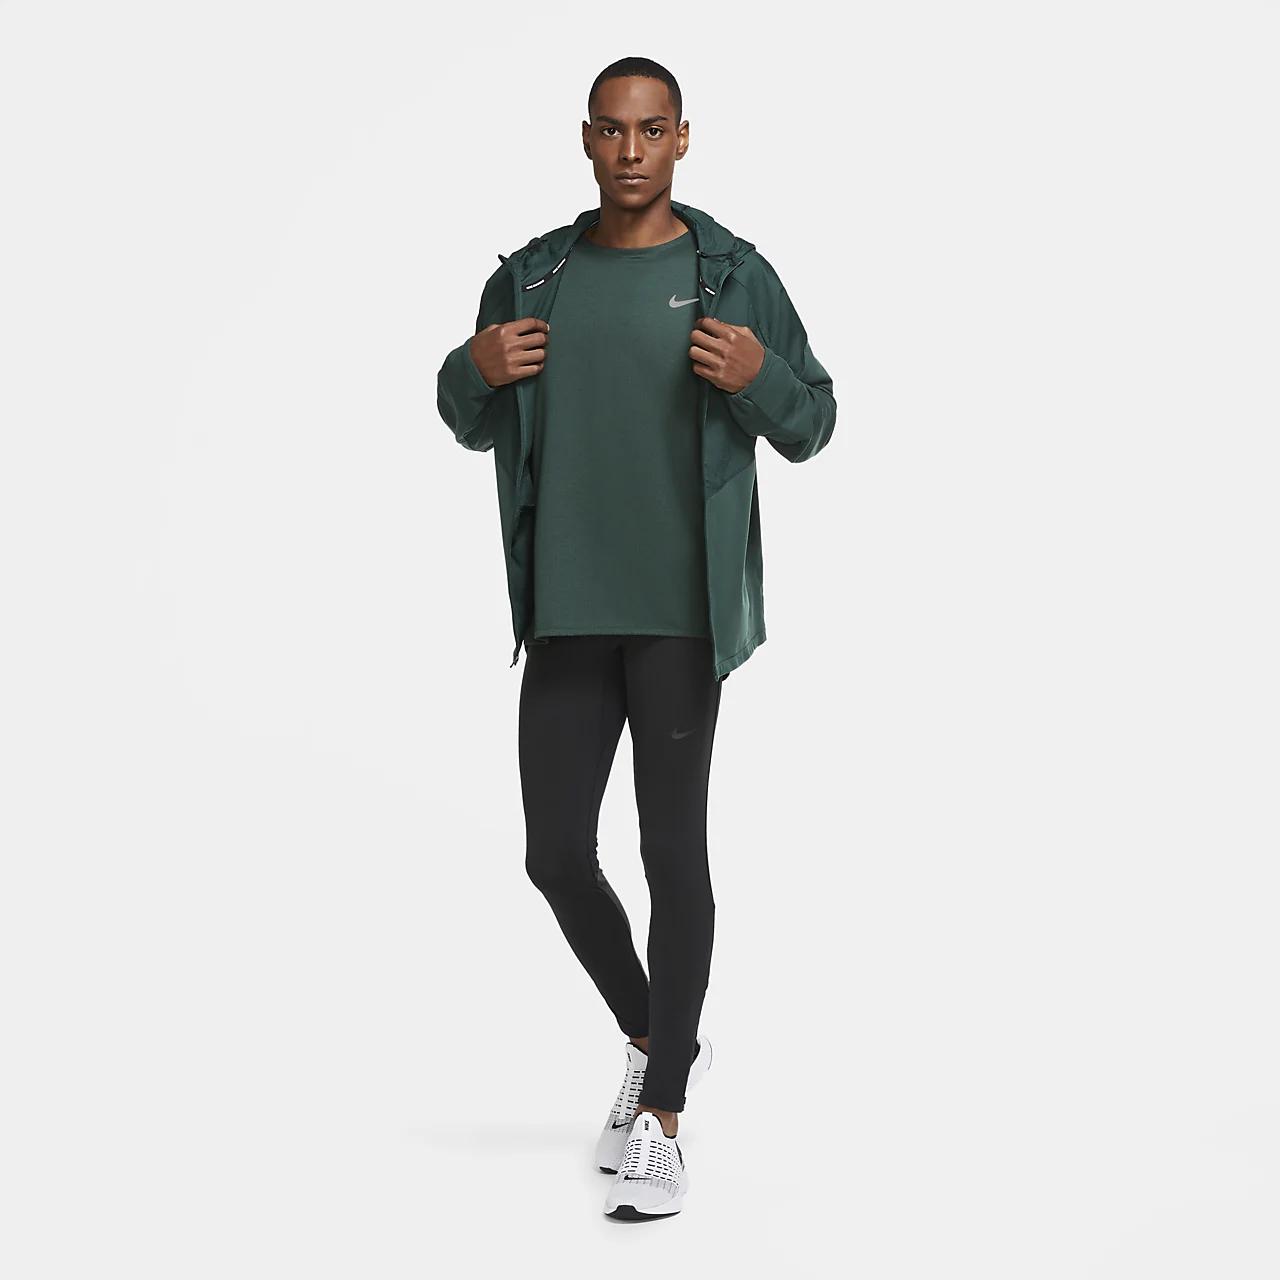 Nike Rise 365 Men's Running Top CJ5420-397